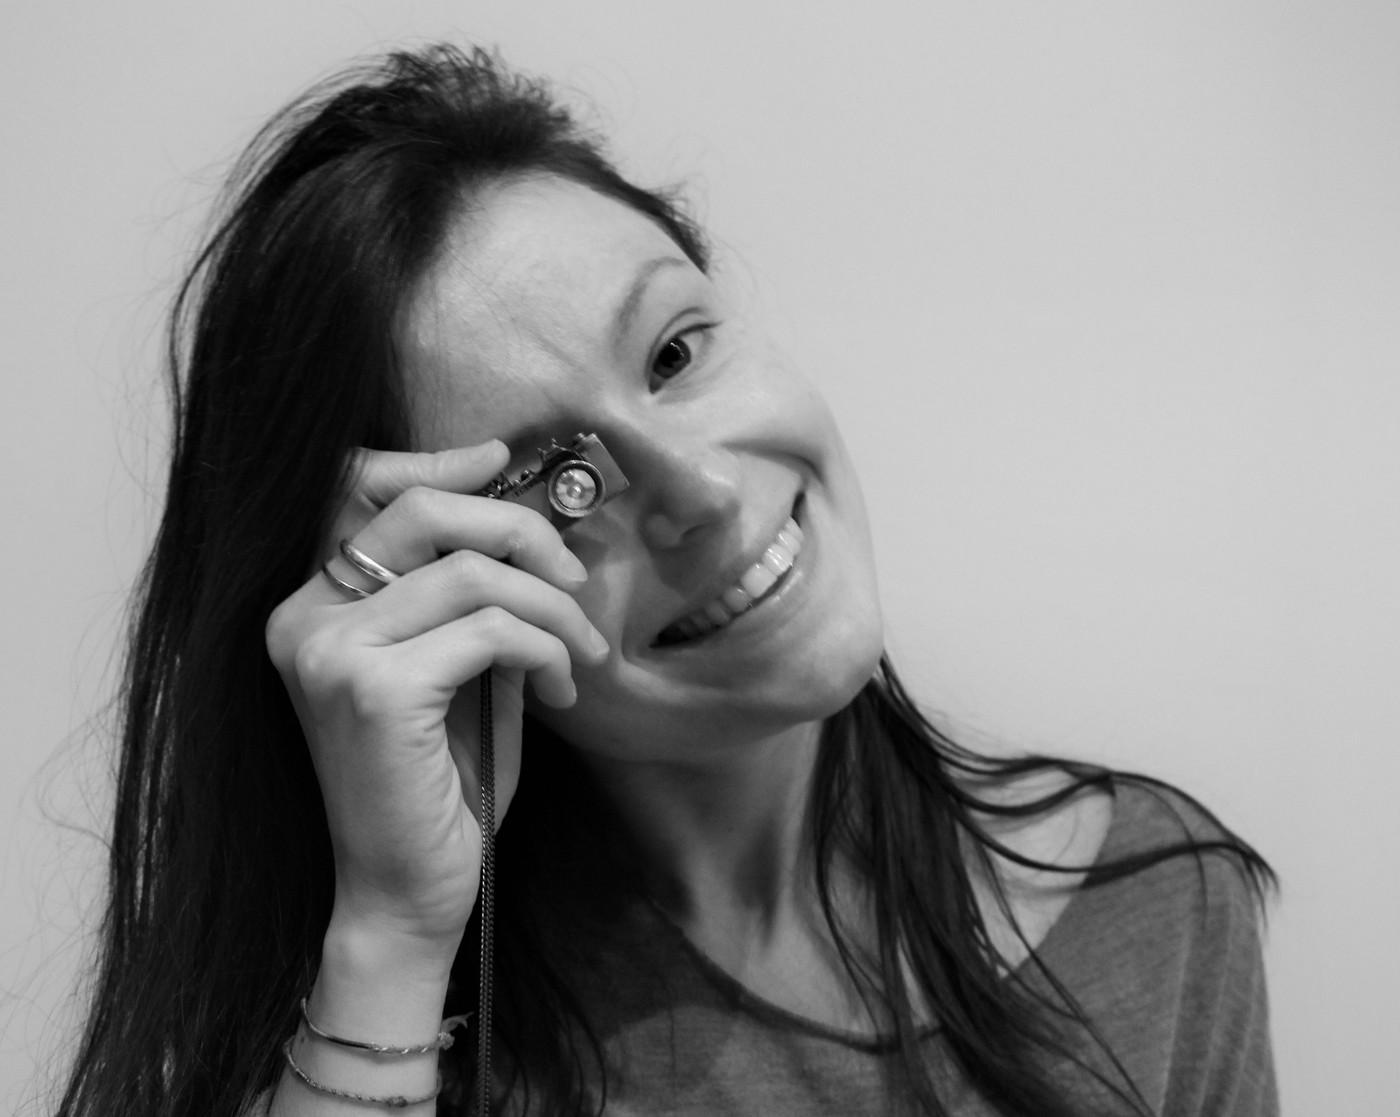 Chiara Borgogno